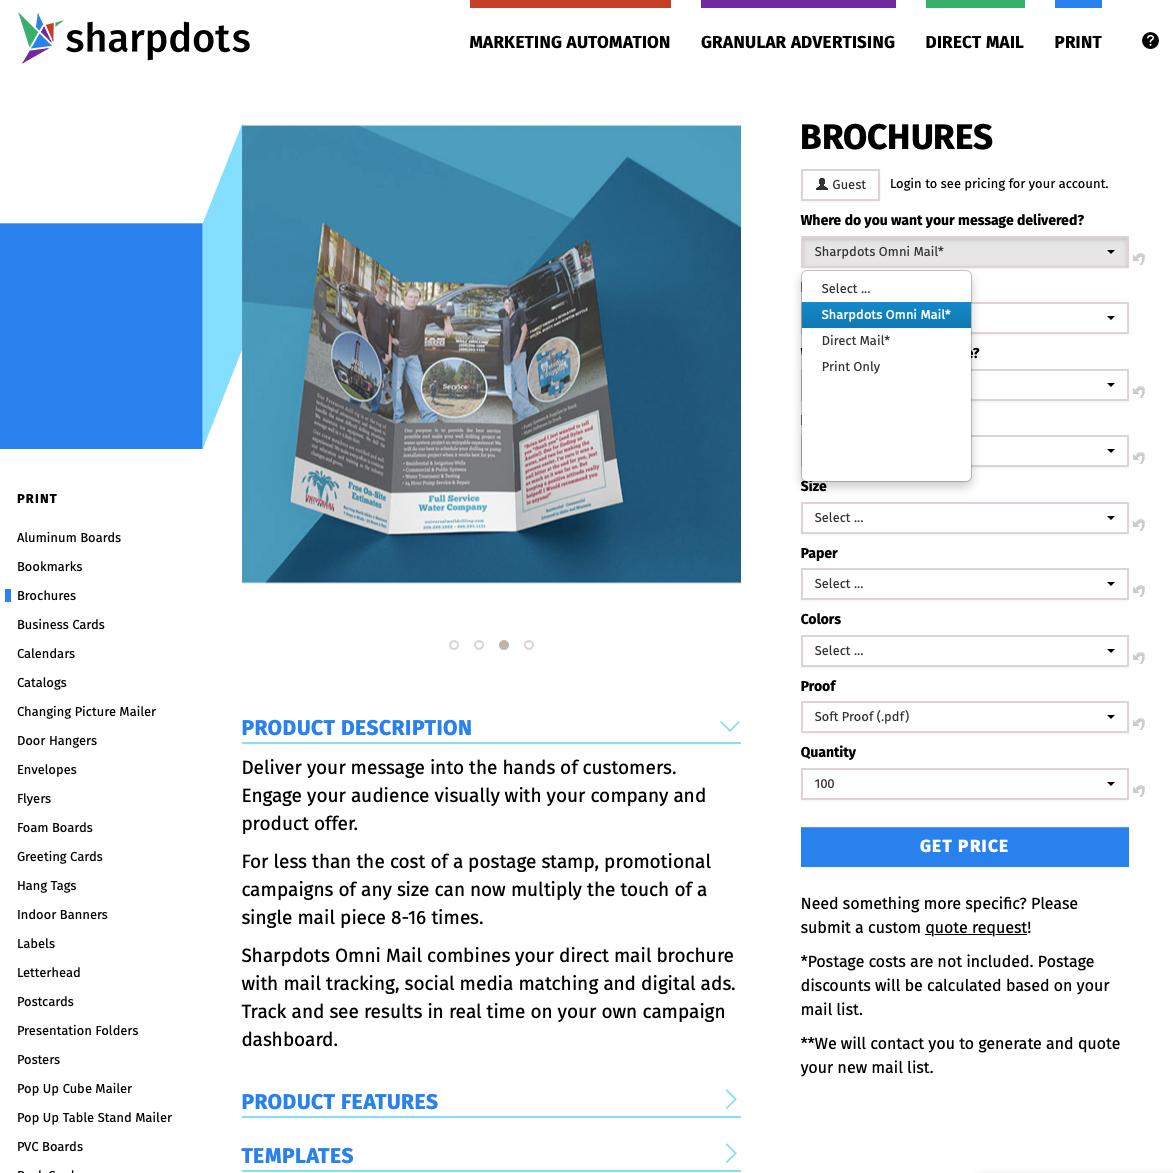 Sharpdots Omni Mail product page